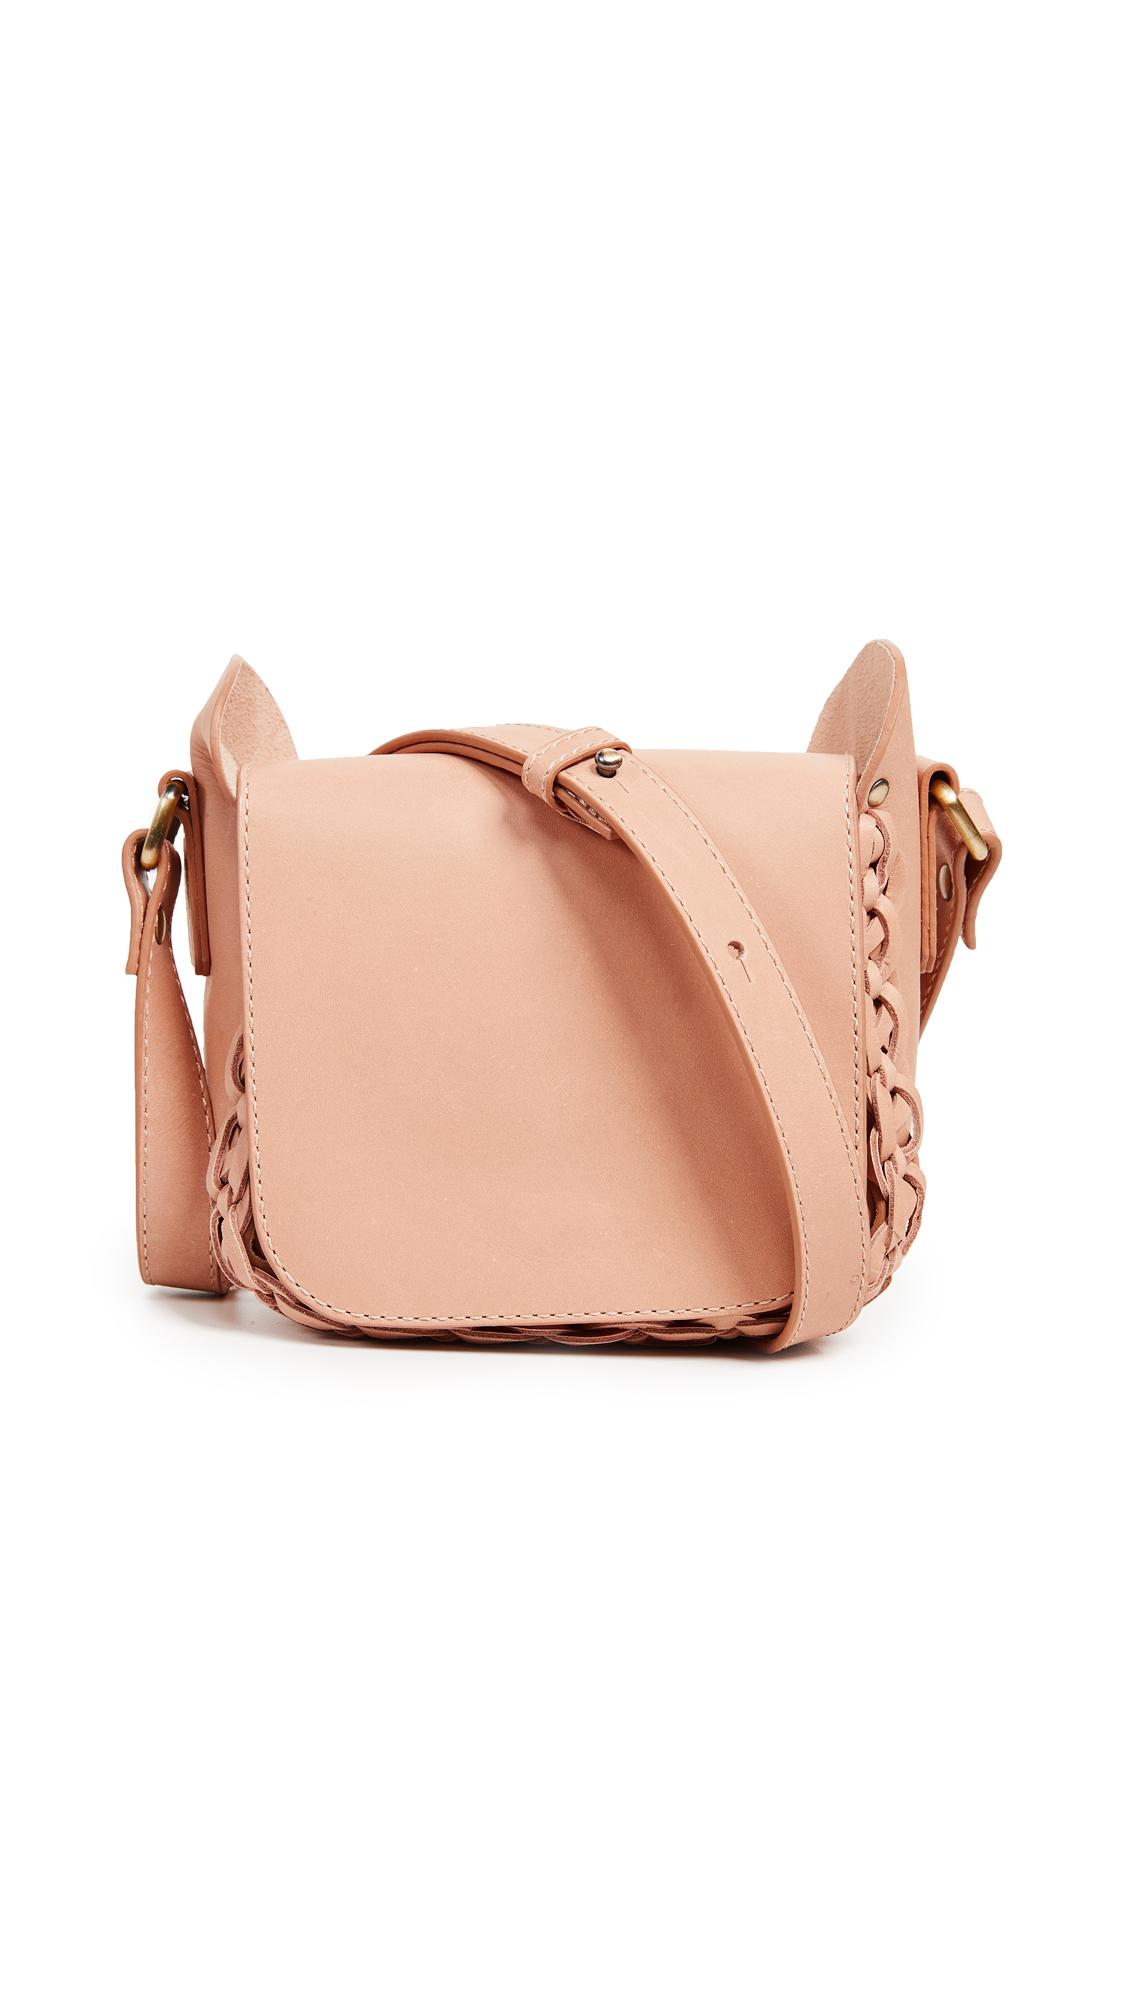 Zimmermann Mini Shoulder Bag - Natural Tan